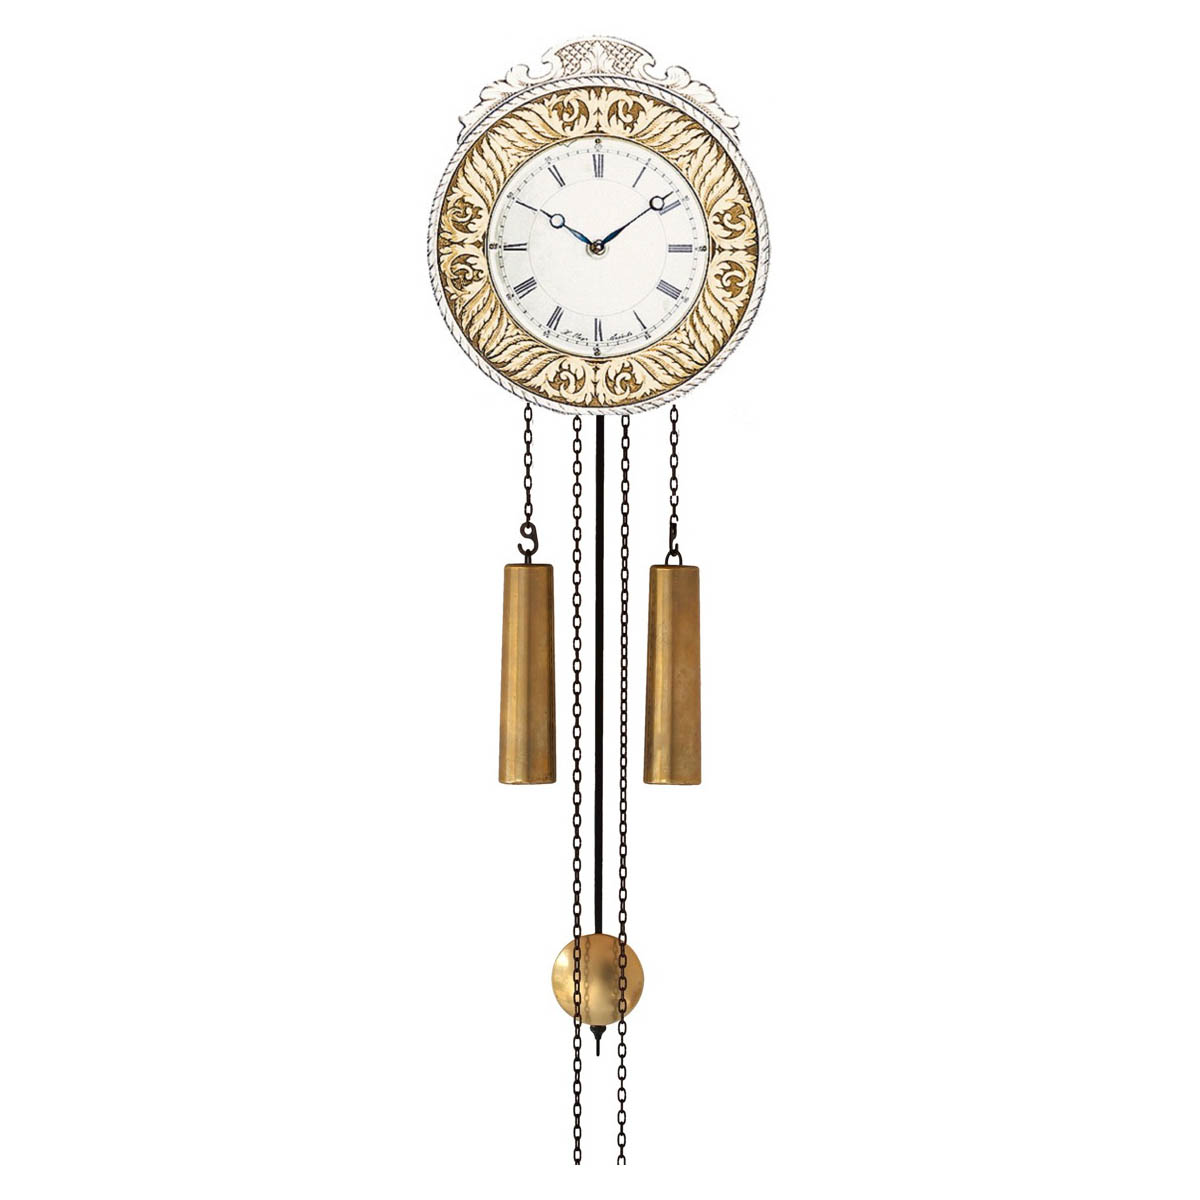 WU1170 Traditional Wall Clock